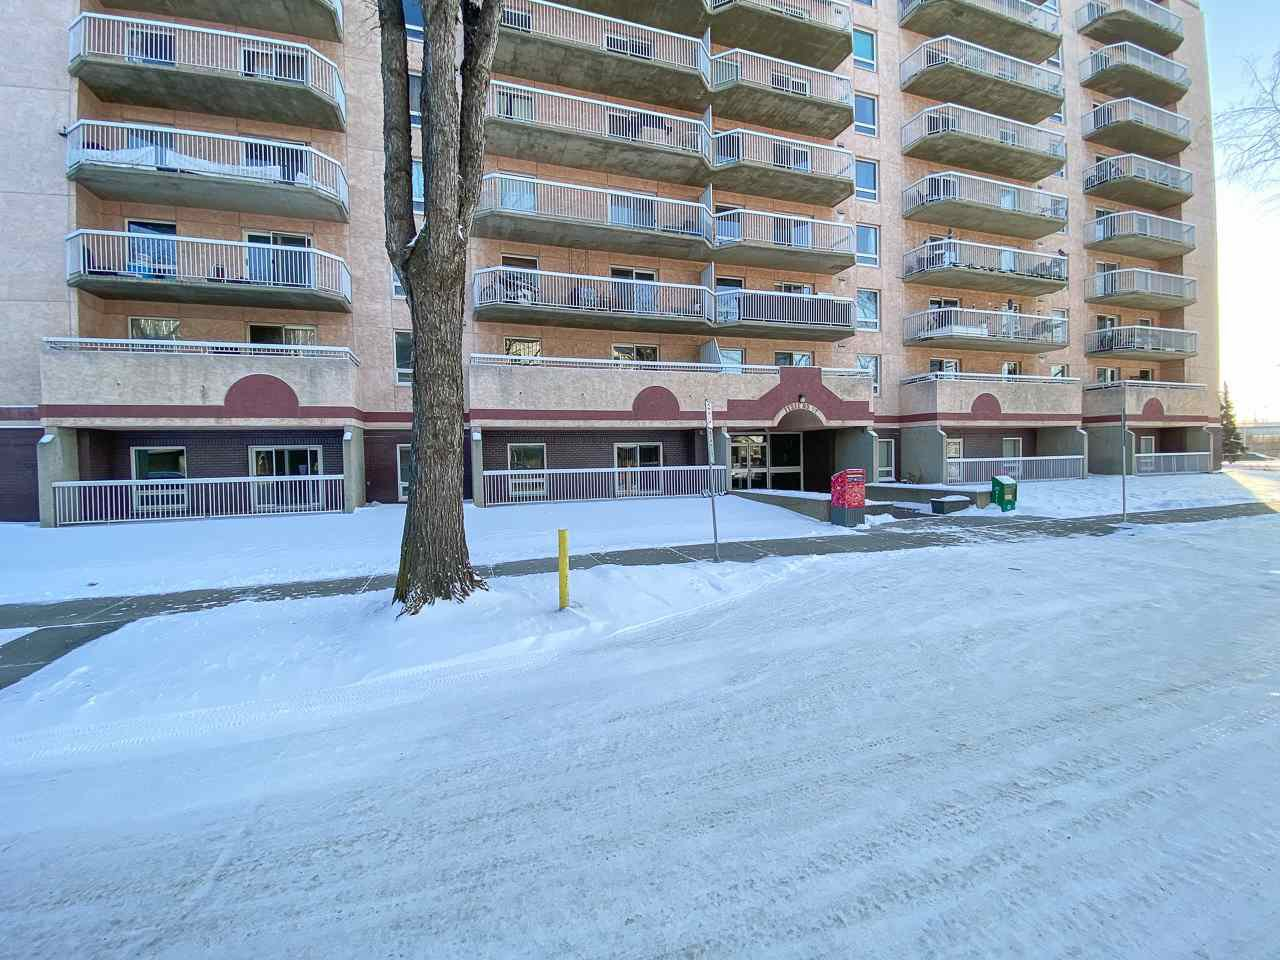 Main Photo: 808 11211 85 Street NW in Edmonton: Zone 05 Condo for sale : MLS®# E4184229